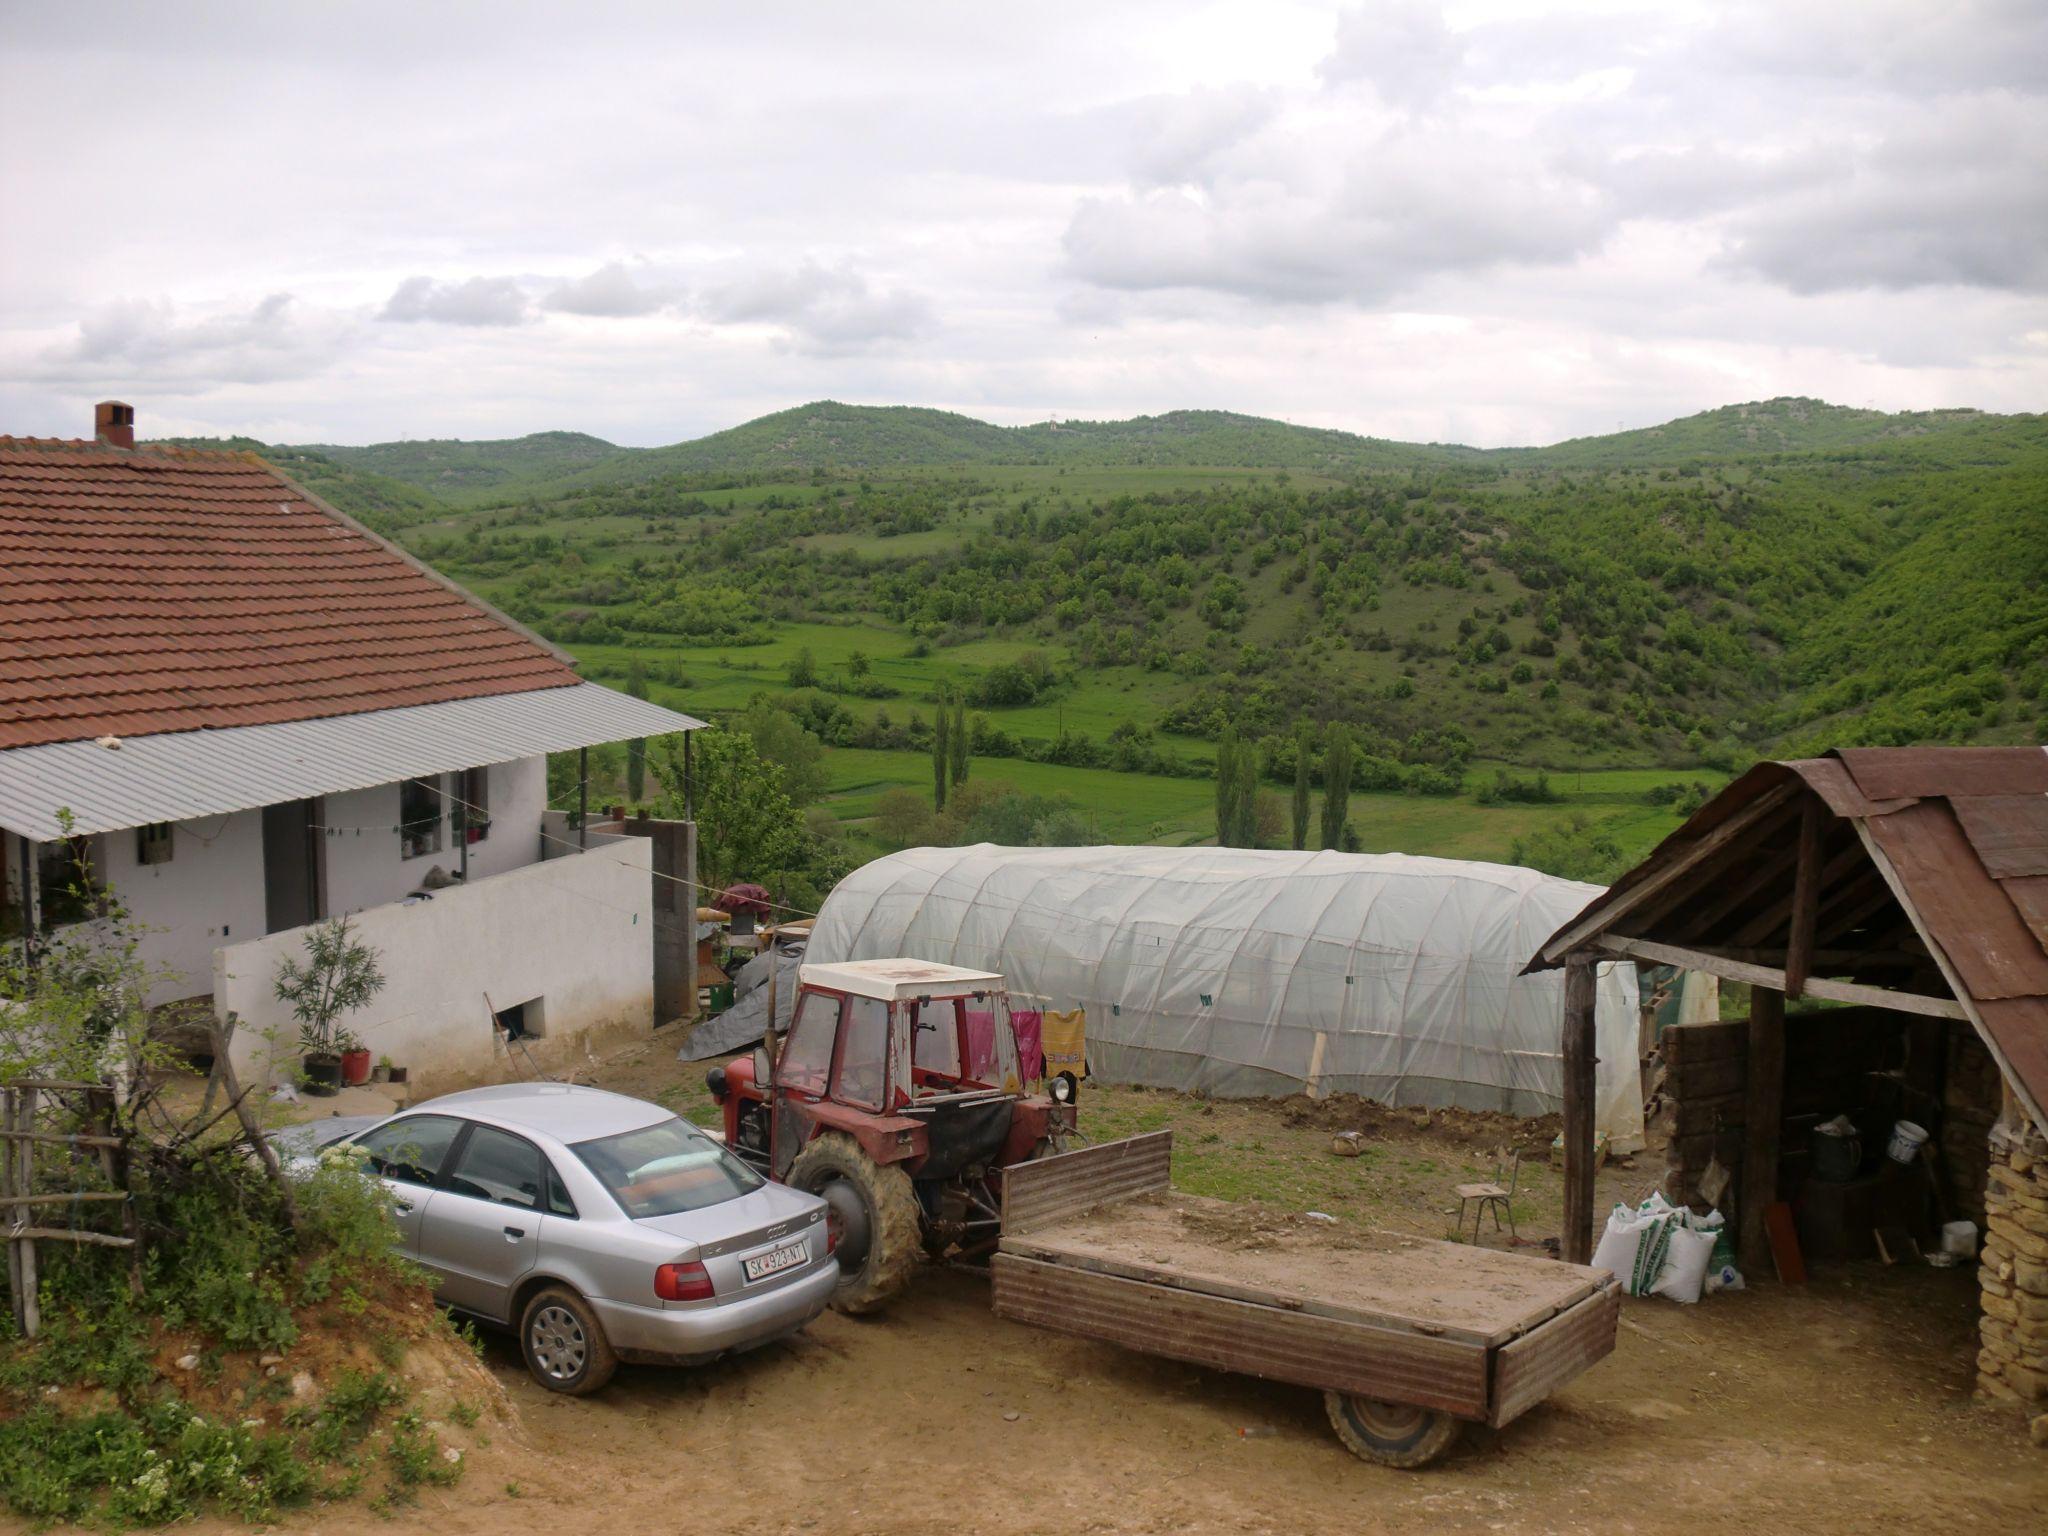 CIMG4402 - Macedonian landscapes